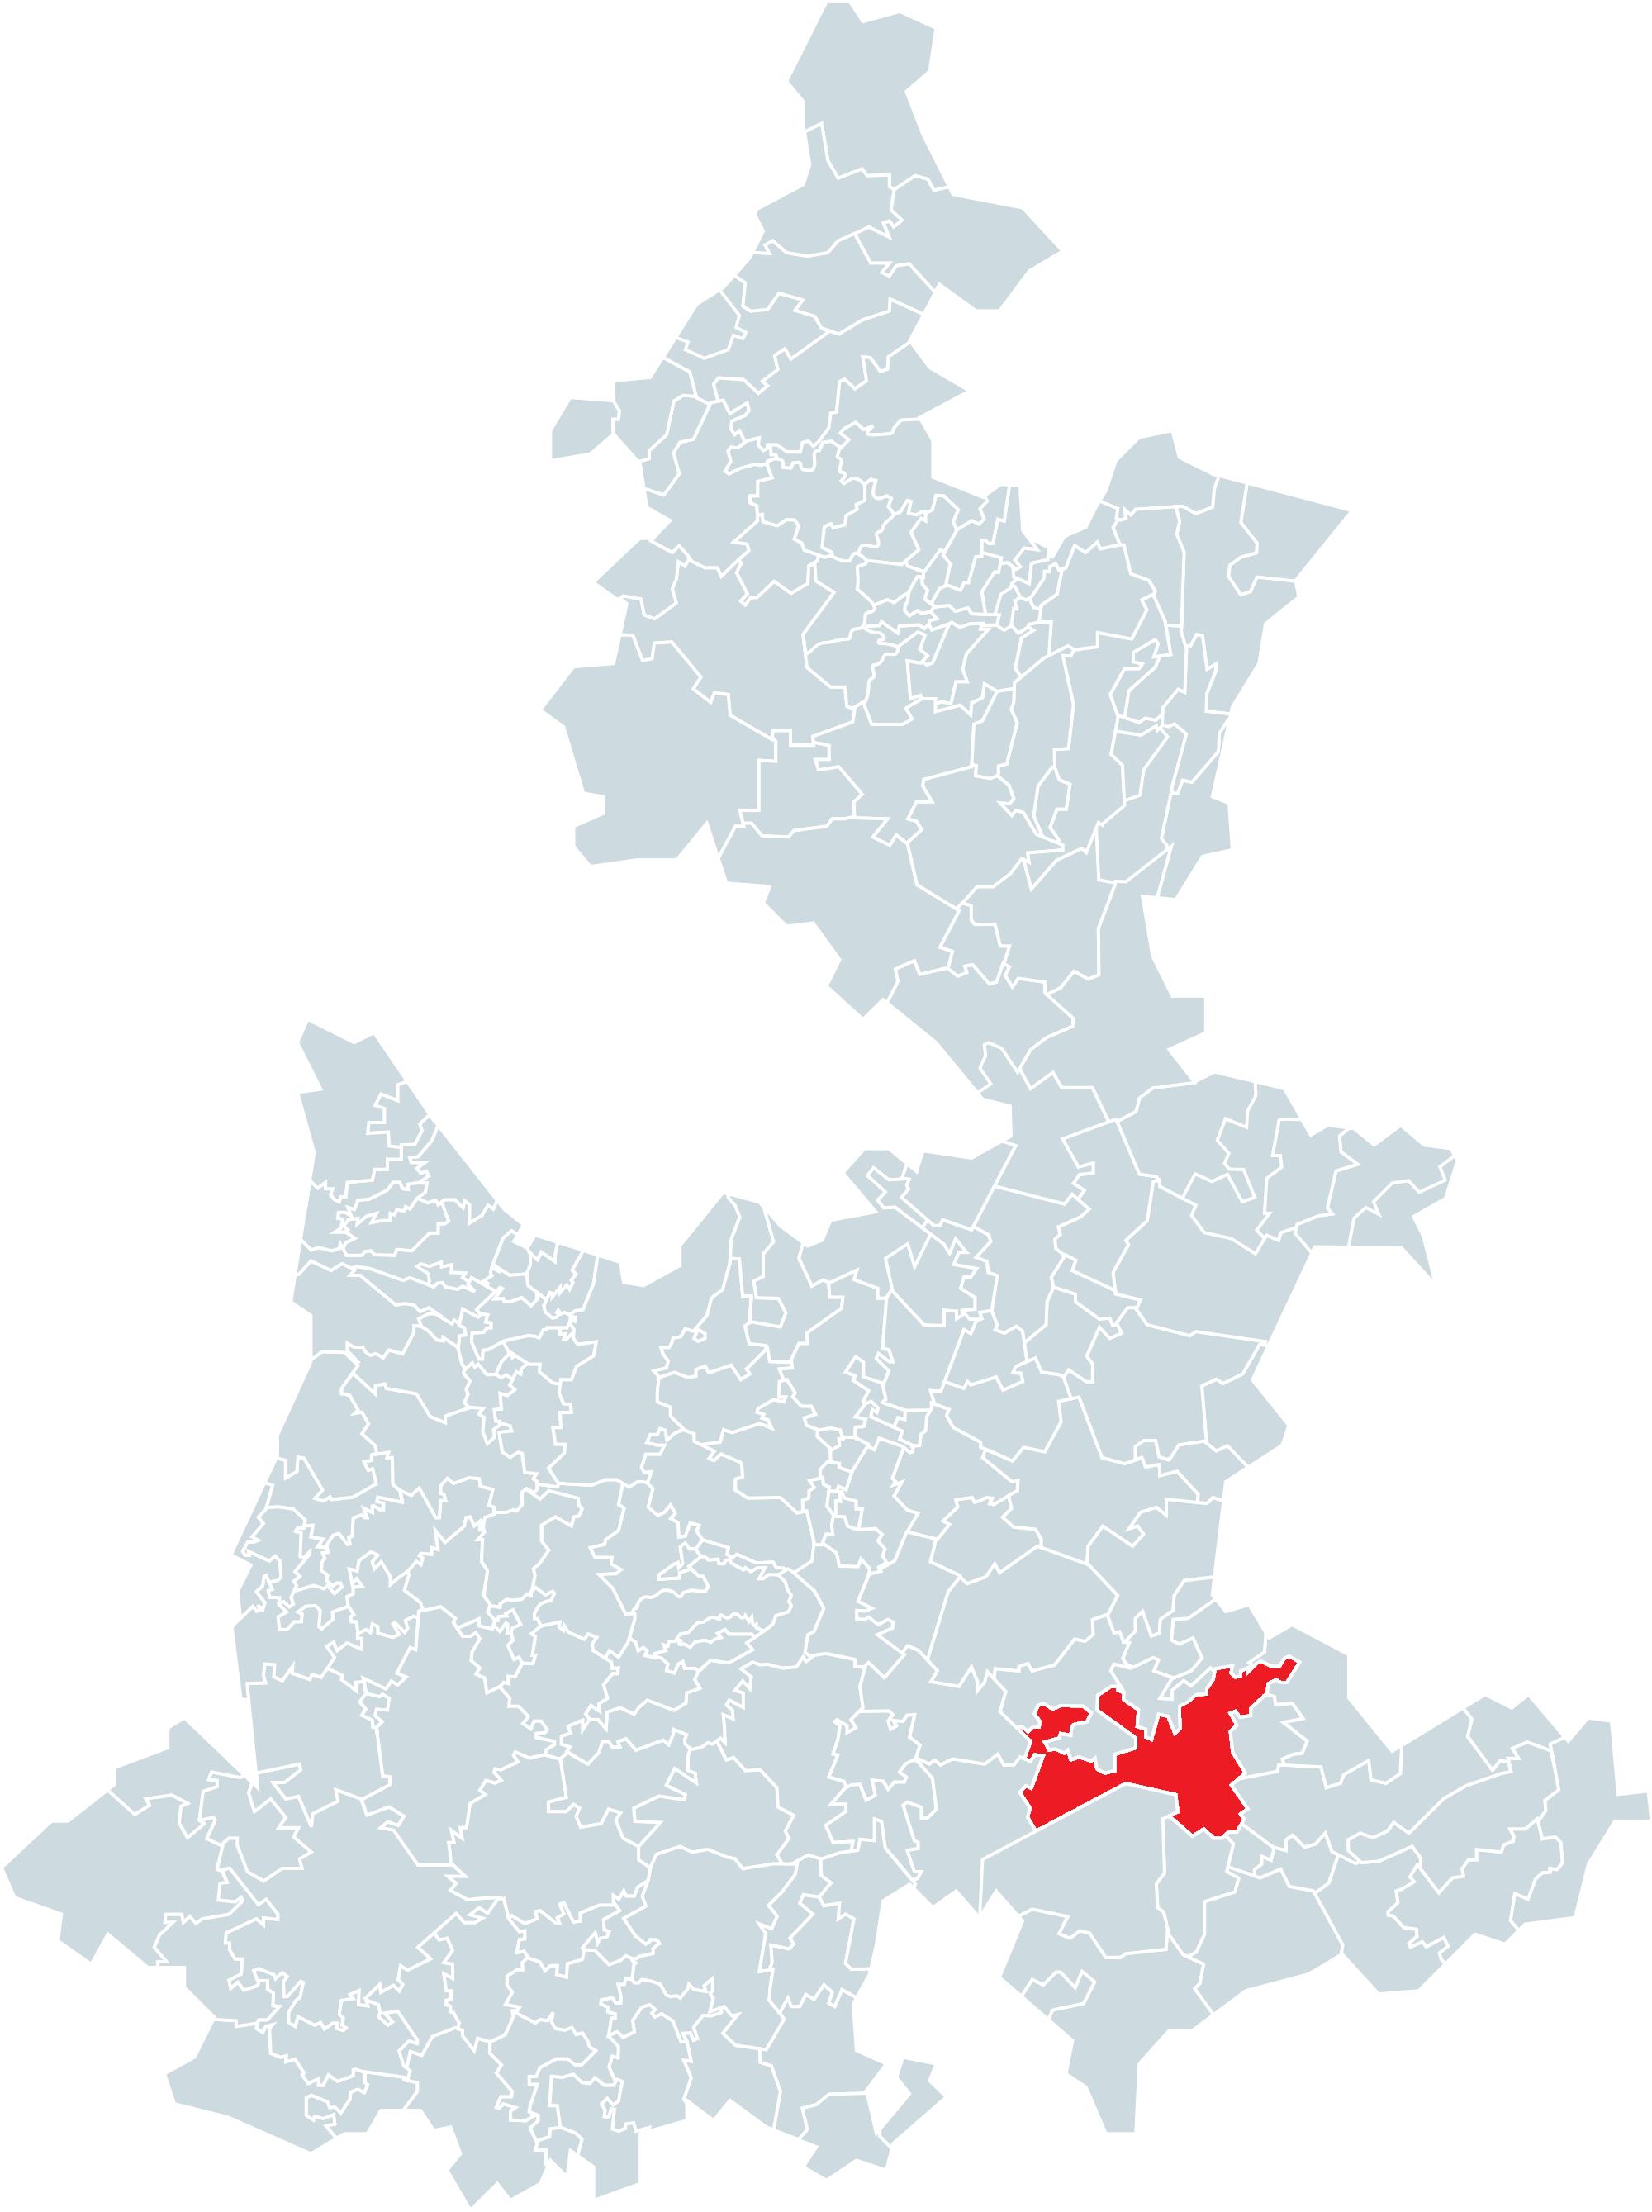 1c8292f81a Tehuacán - Wikipedia